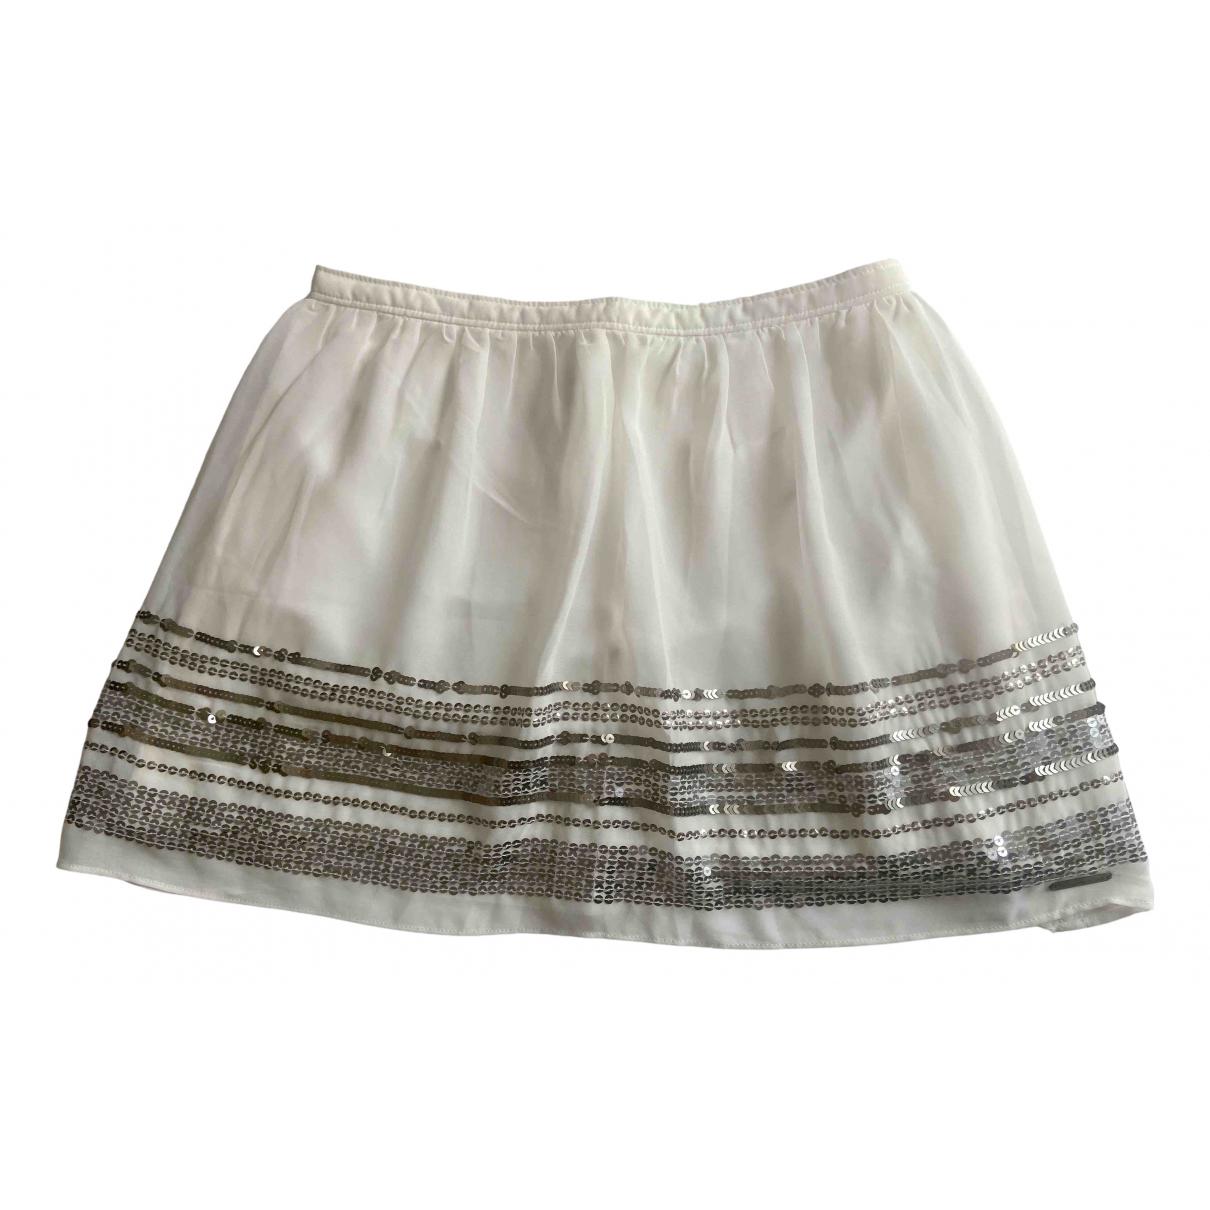 Abercrombie & Fitch - Jupe   pour femme - blanc